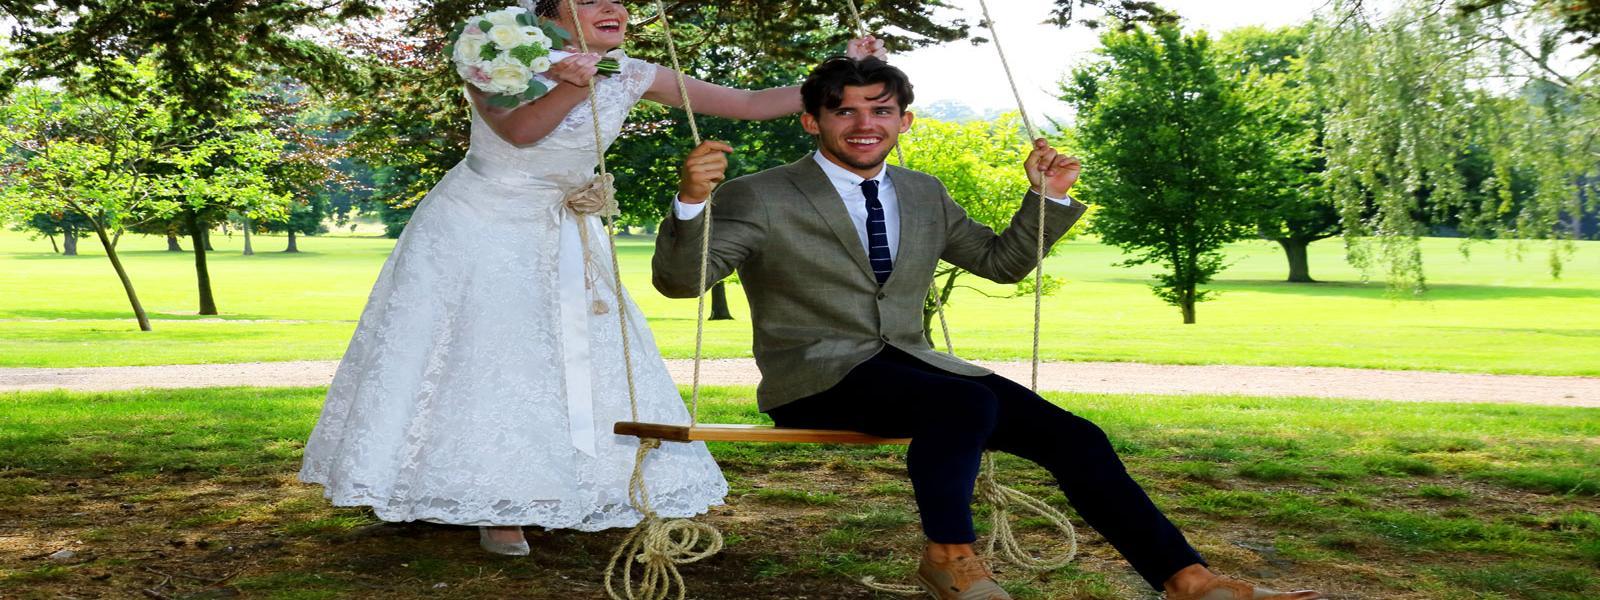 bride pushes groom on swing